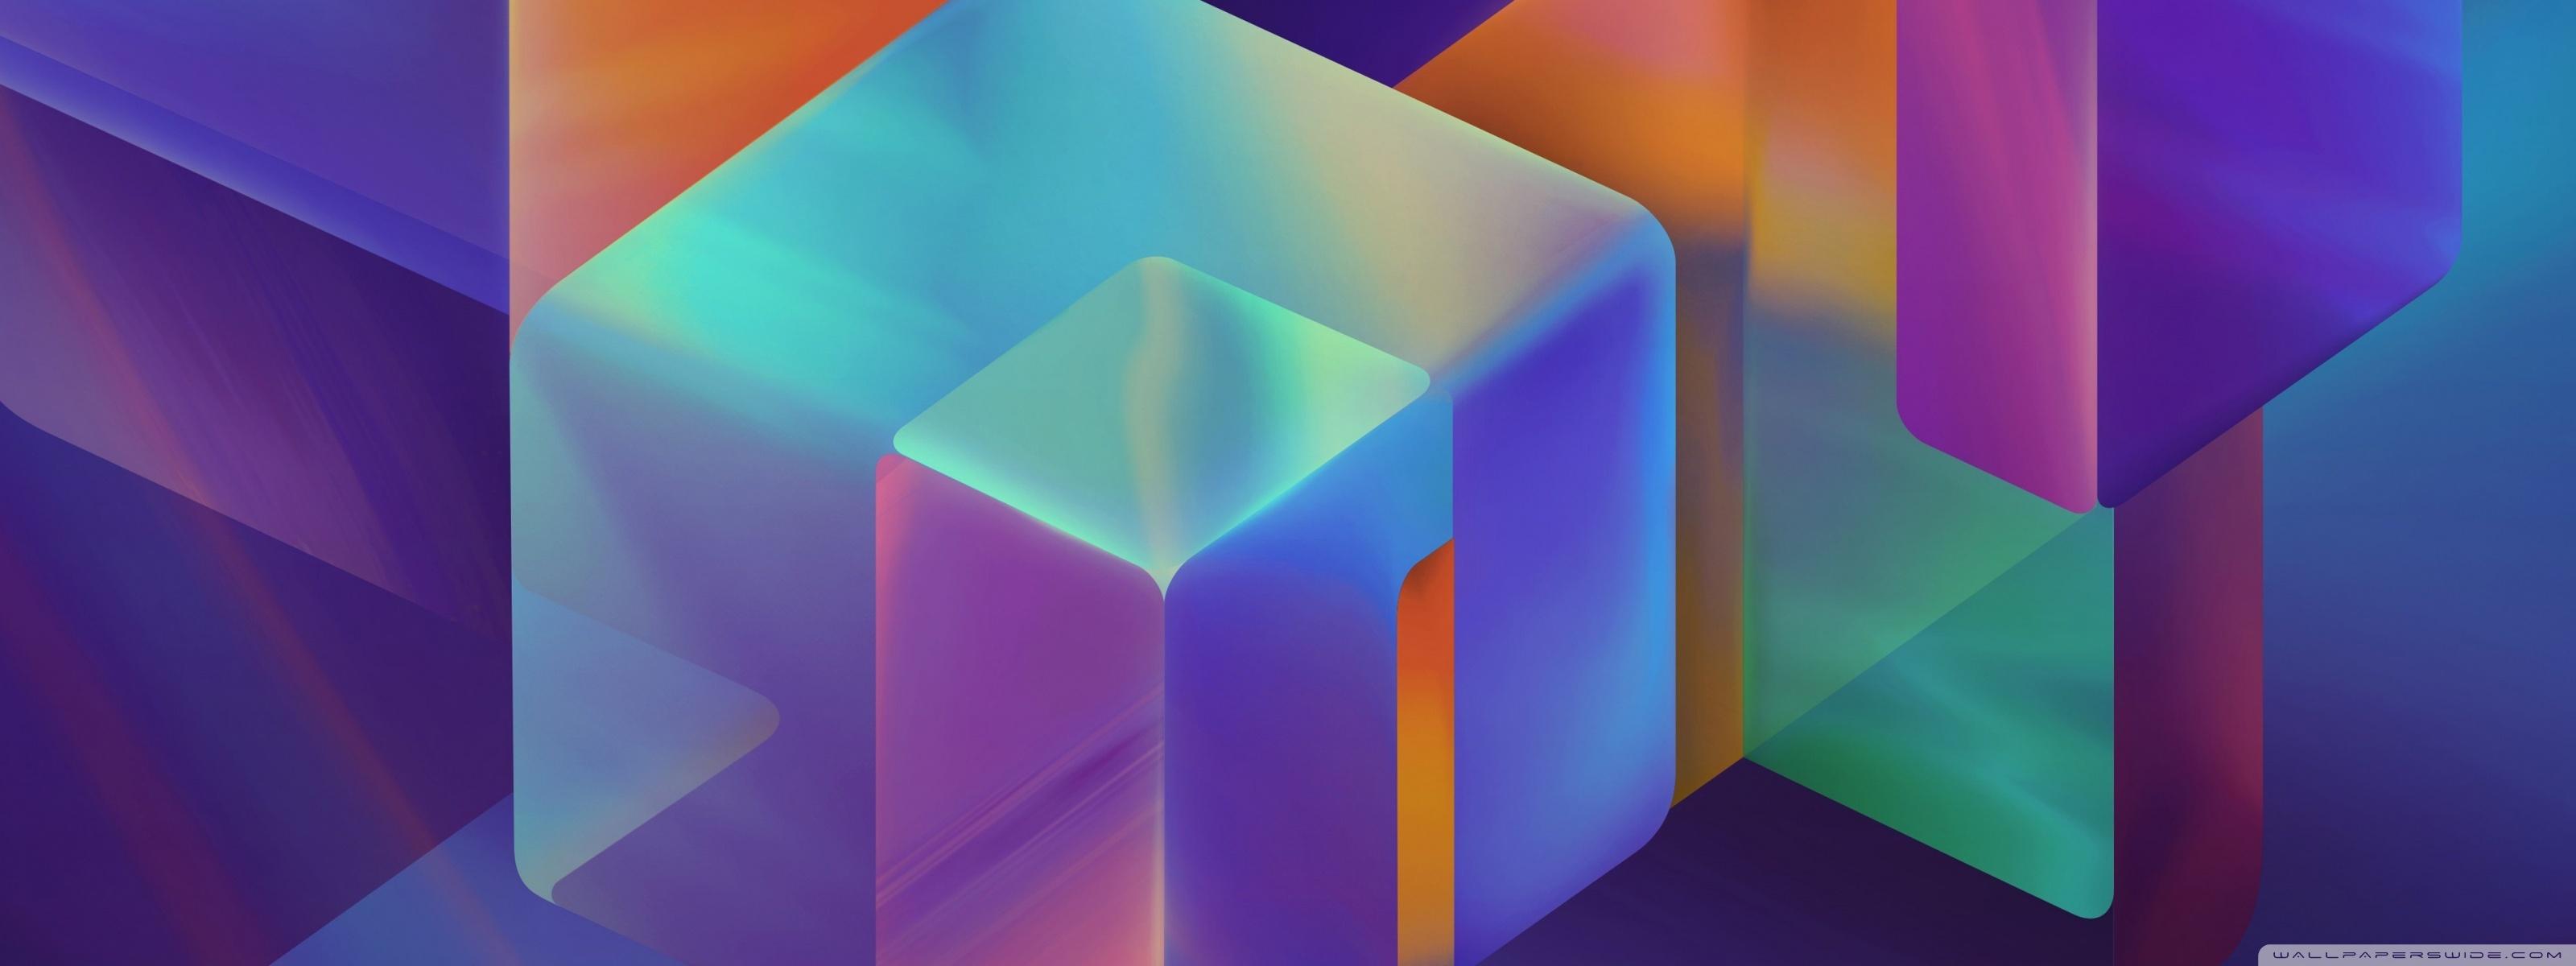 wallpaper modern abstract - photo #36